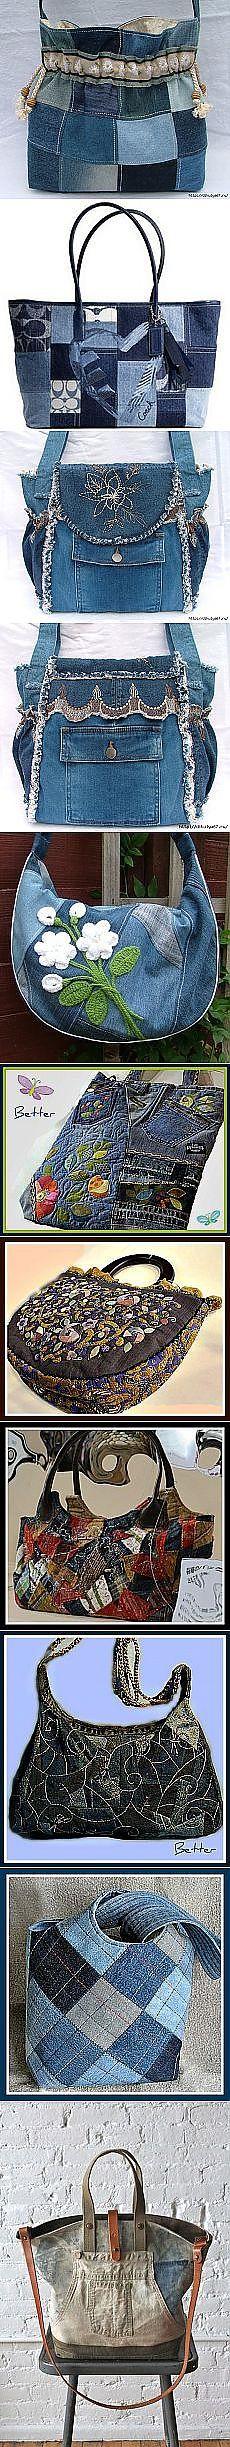 Поиск на Постиле: джинсовые сумки Denim Purse, Tote Purse, Tote Bags, Diy Bags Purses, Purses And Handbags, Jean Purses, Denim Handbags, Denim Ideas, Denim Crafts